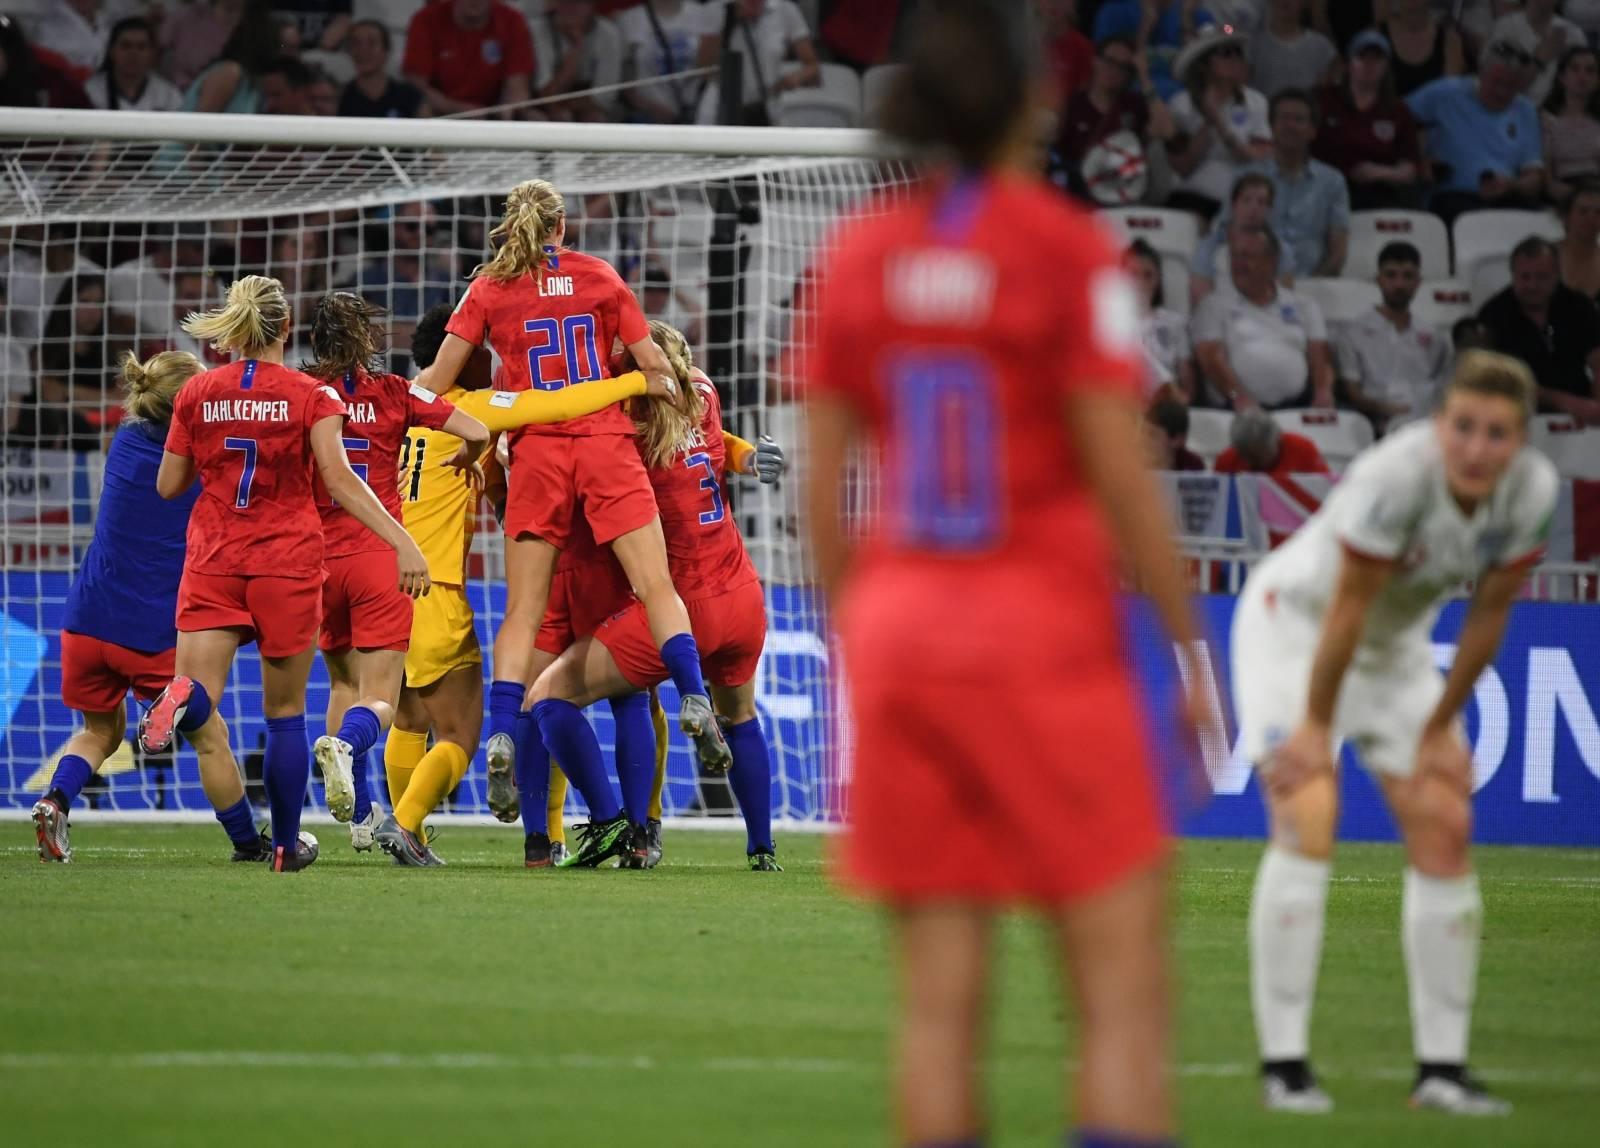 Women's Football World Cup - England - USA